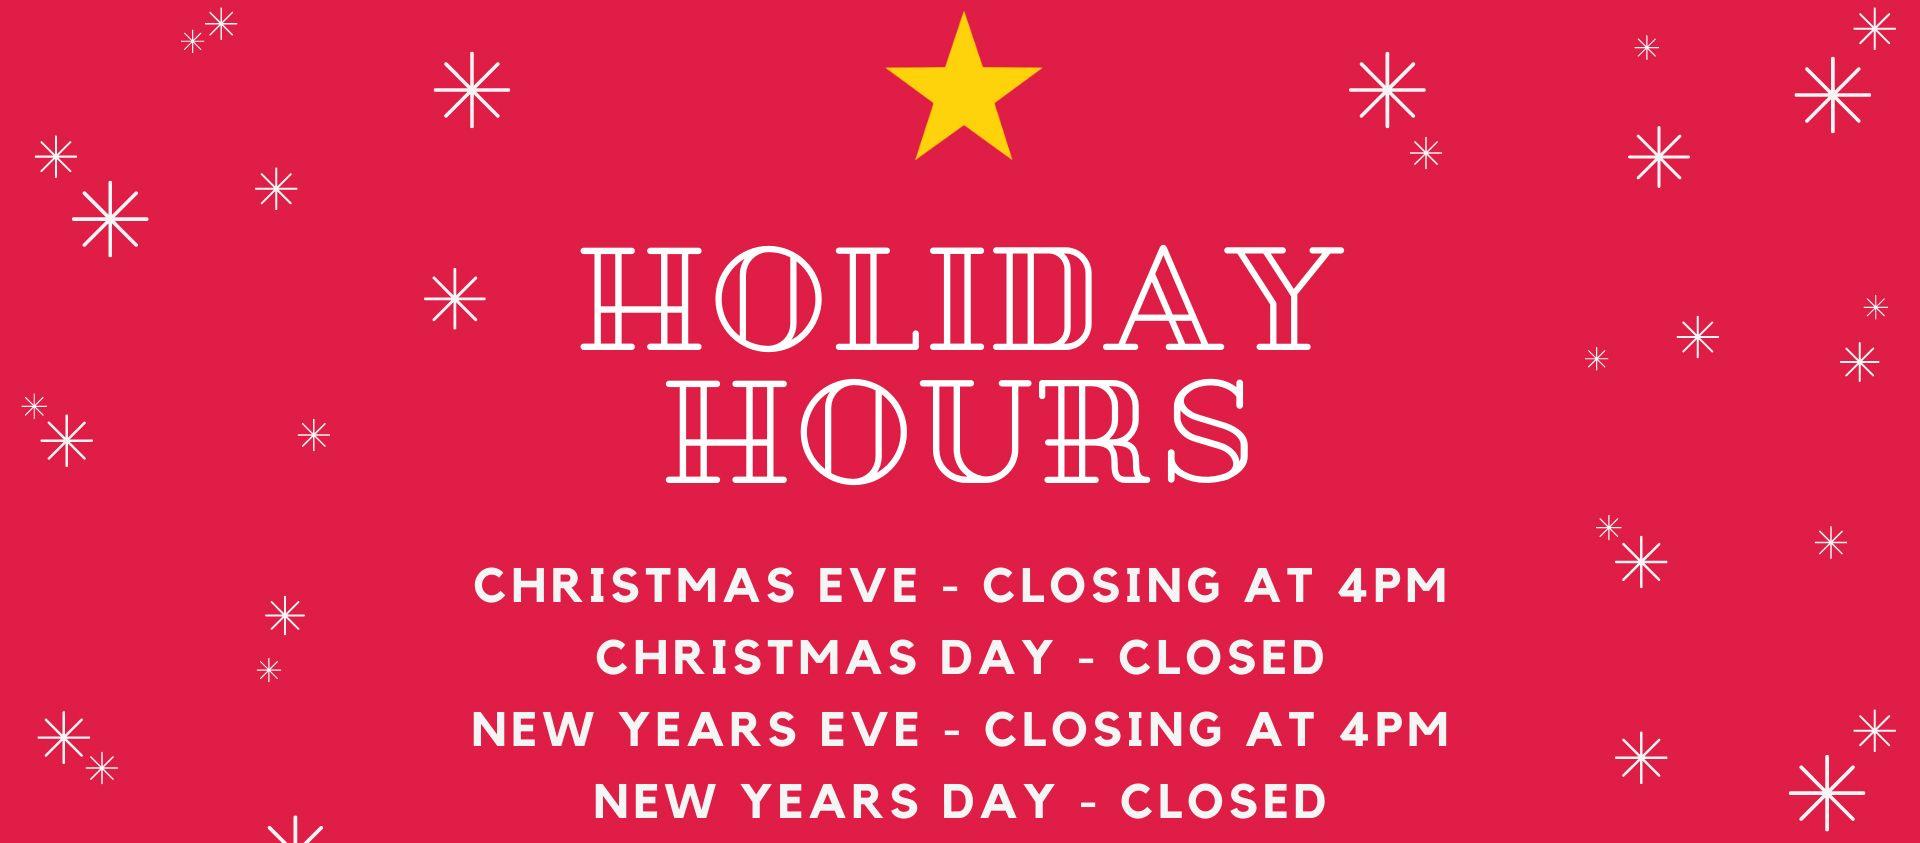 Holiday Hours2 (1).jpg